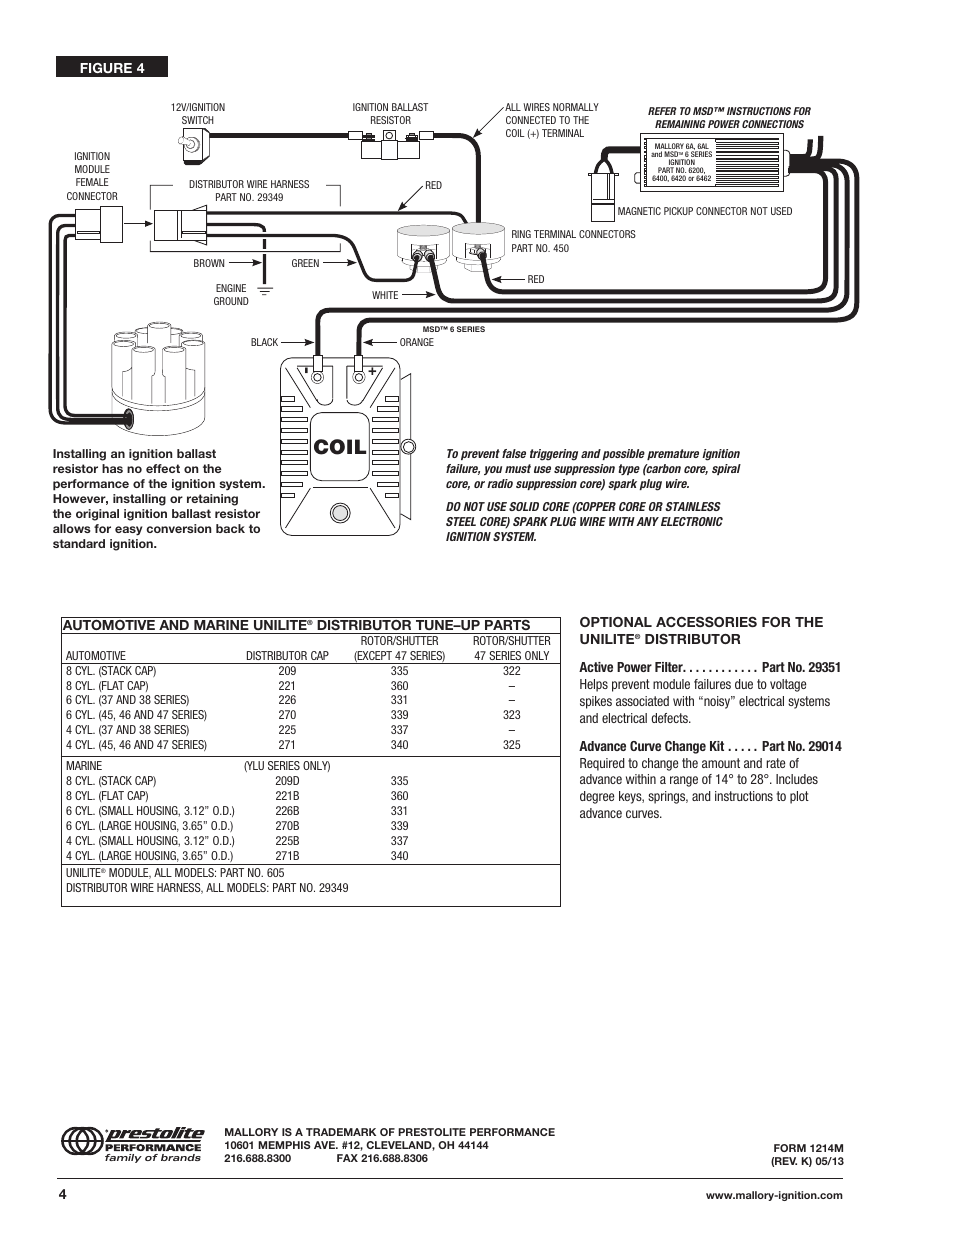 Boss Bv Wiring Harness Diagram on boss 16 pin wiring harness, boss bv9557 wire diagram, boss bv9560b wiring harness, boss rt3 wiring-diagram, boss plow wiring harness, boss snow plow frame diagram,